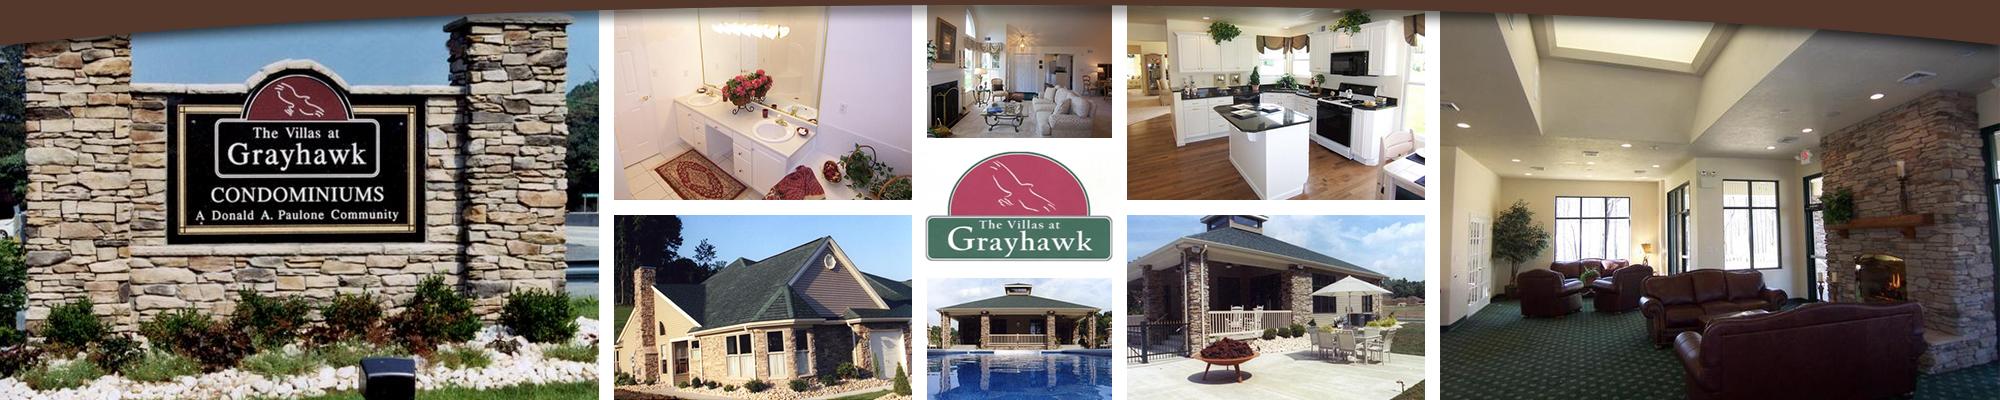 paulone companies grayhawk condominiums